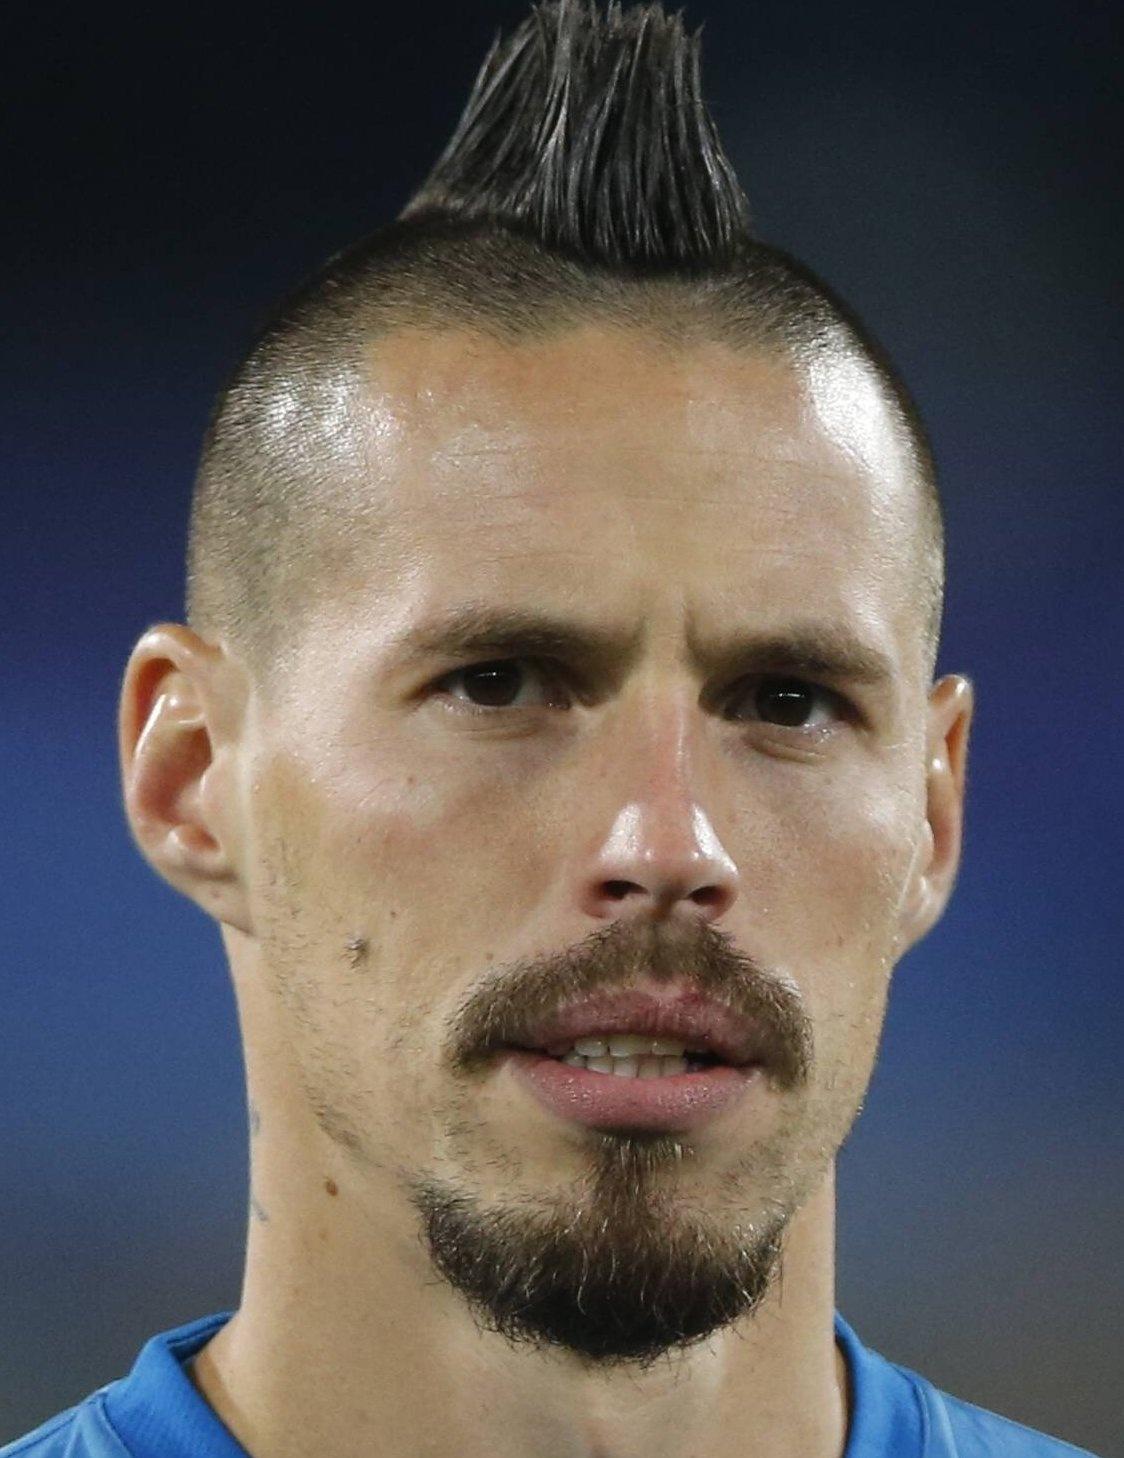 Marek hamsik profilo giocatore 2019 transfermarkt for Marek hamsik squadre attuali